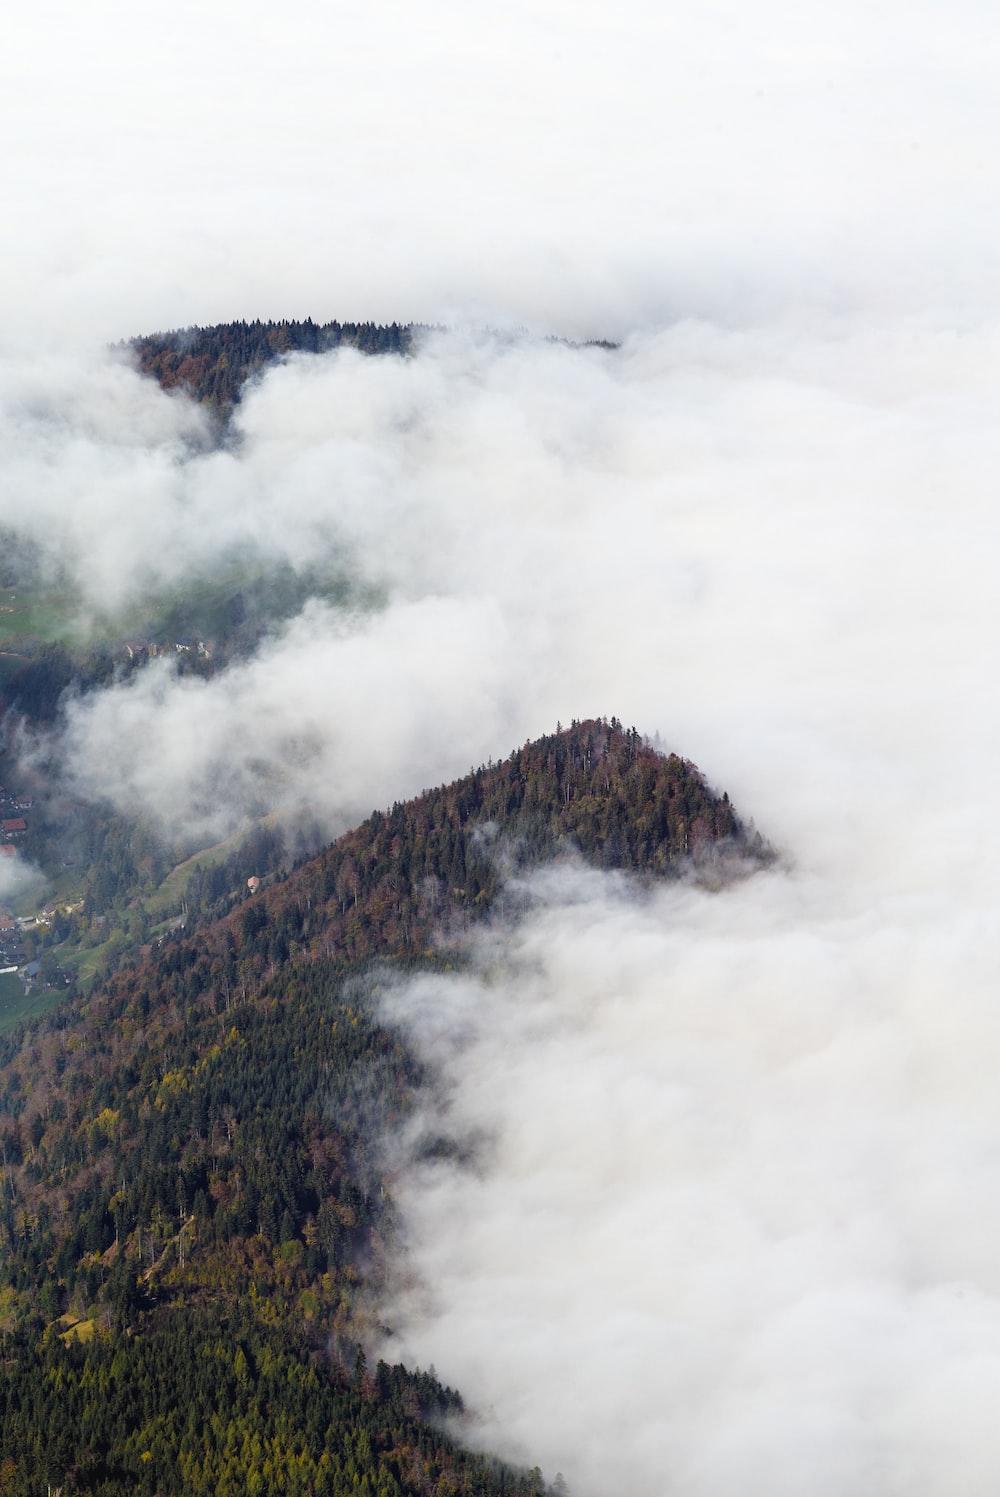 mountain foggy scenery